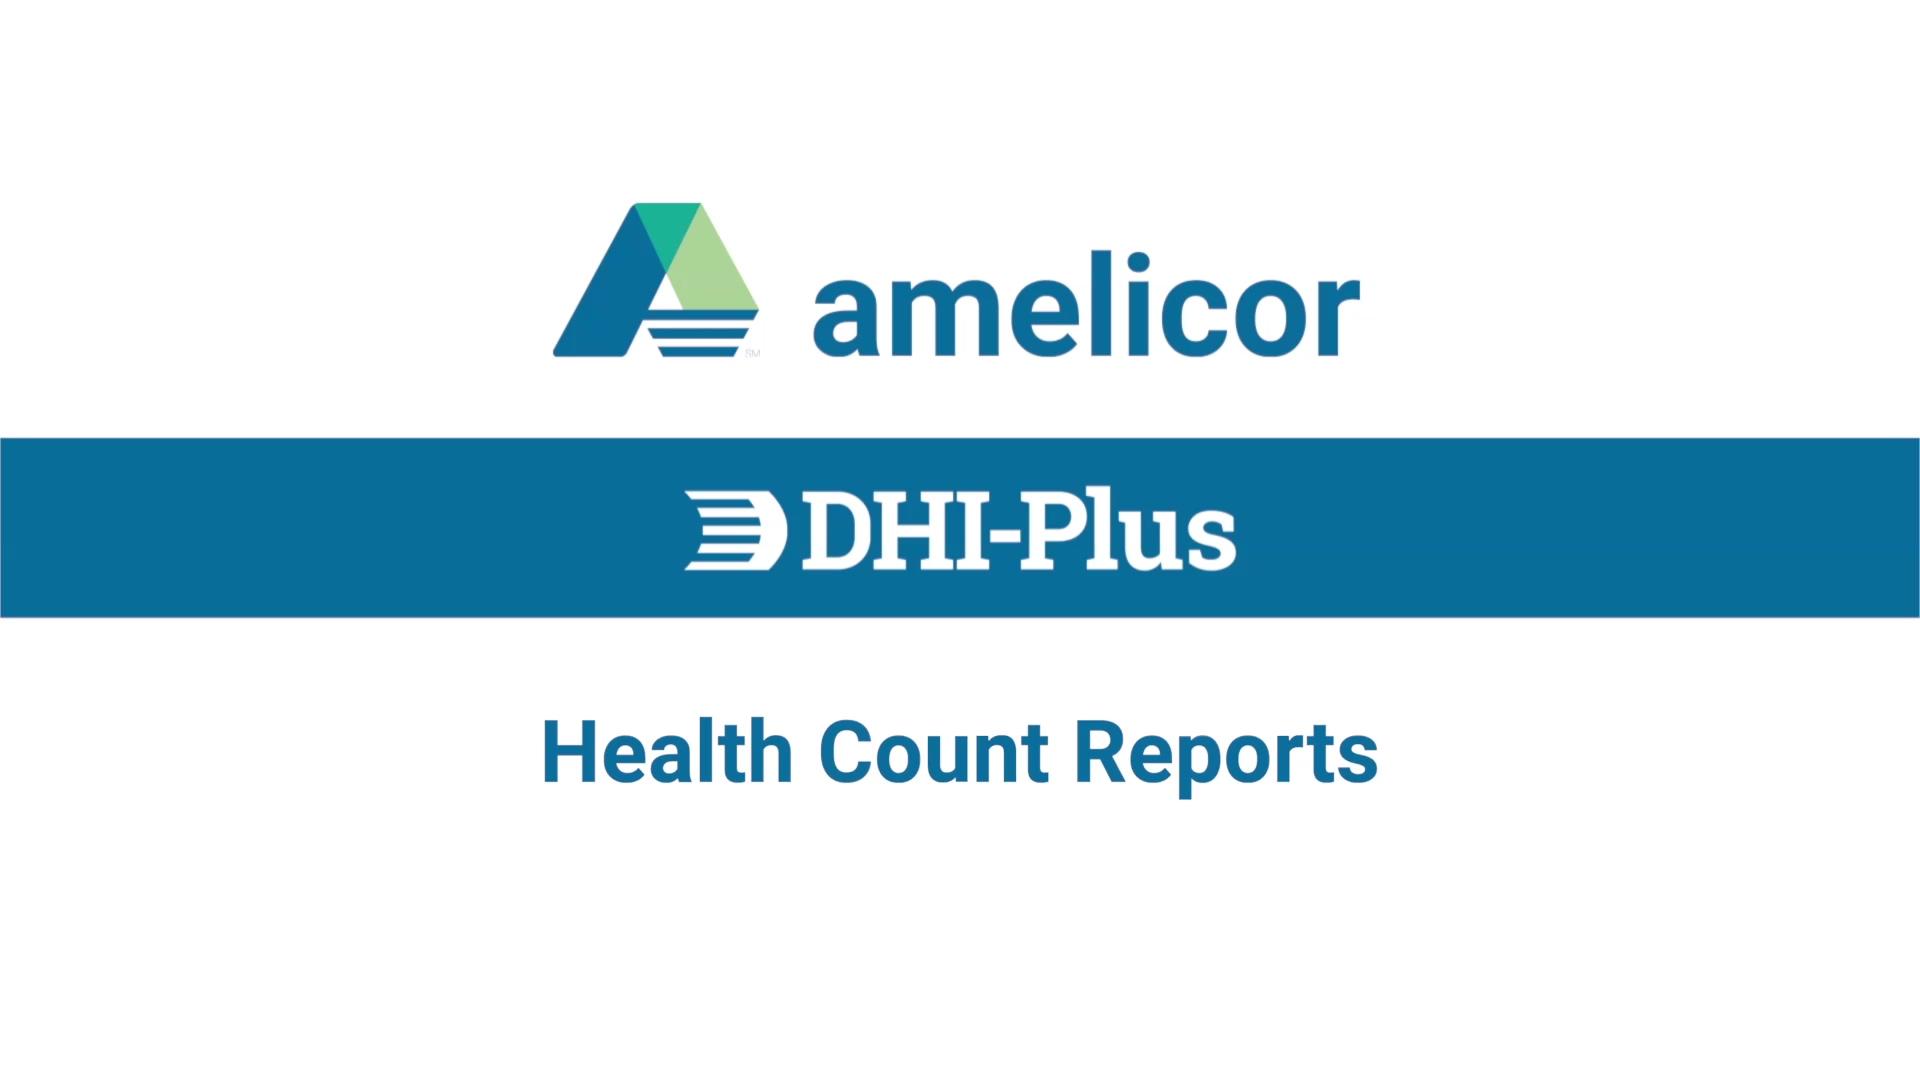 DHI-Plus Health Counts